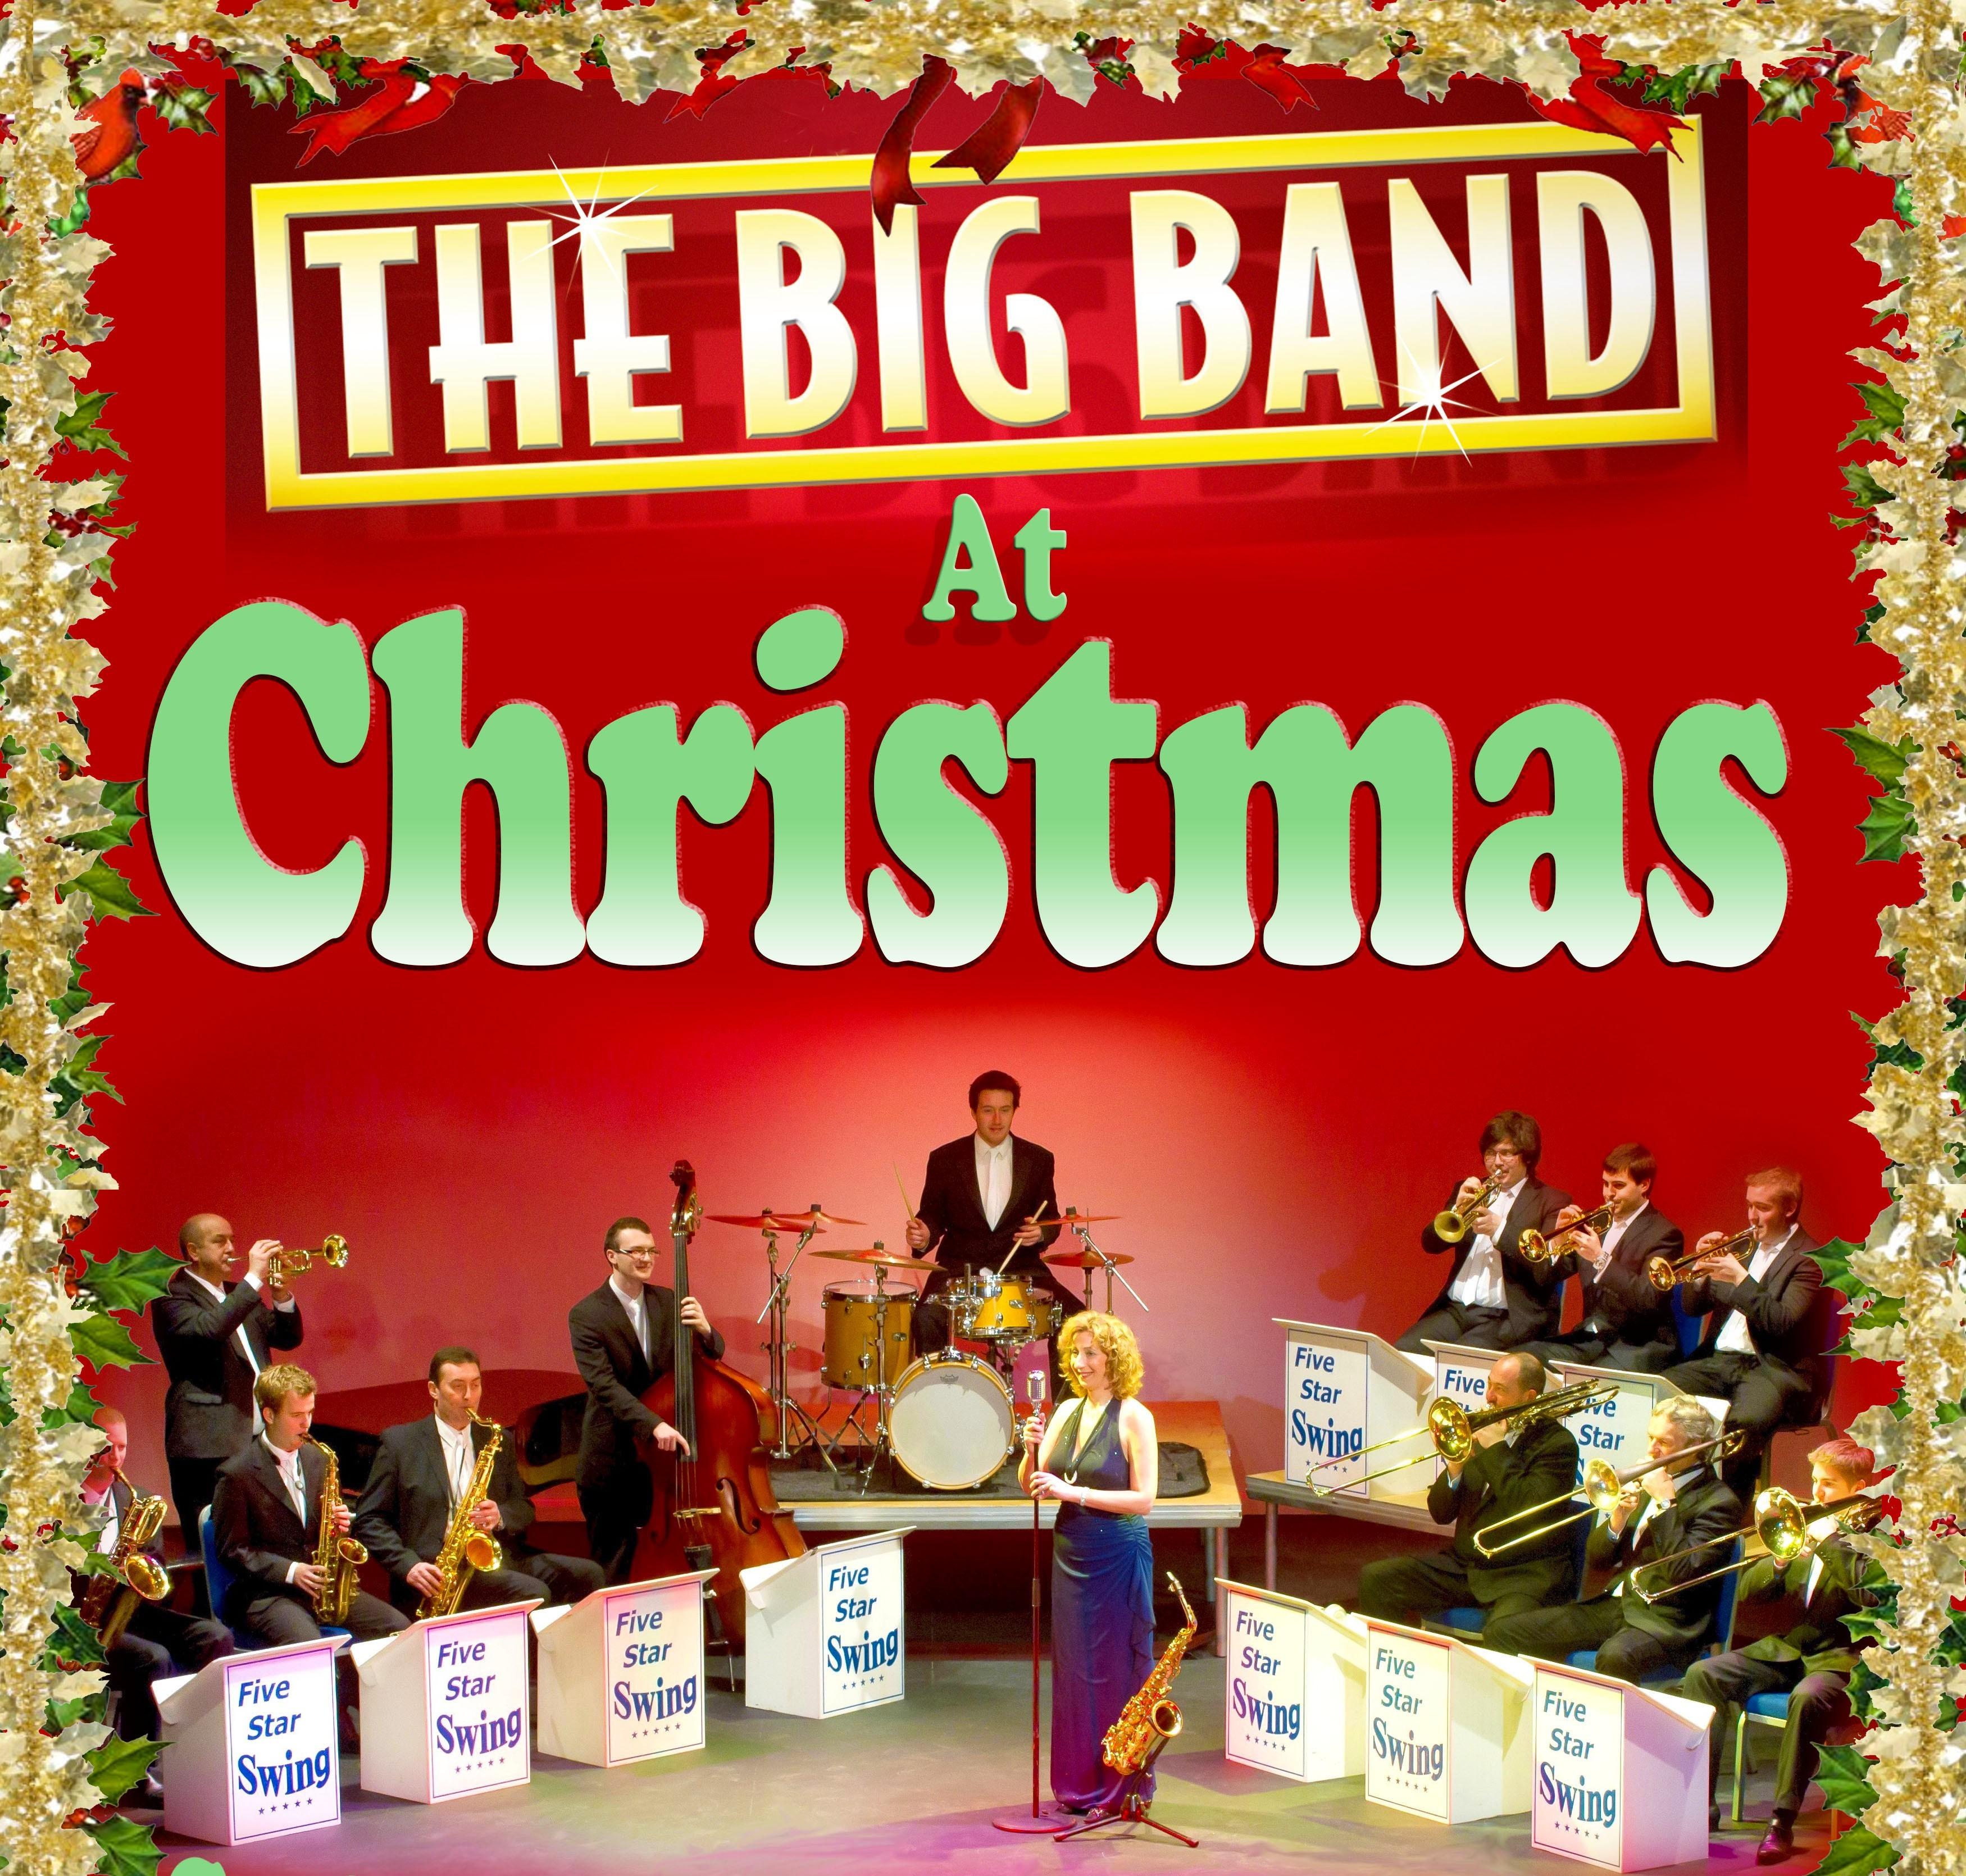 Big Band at Christmas